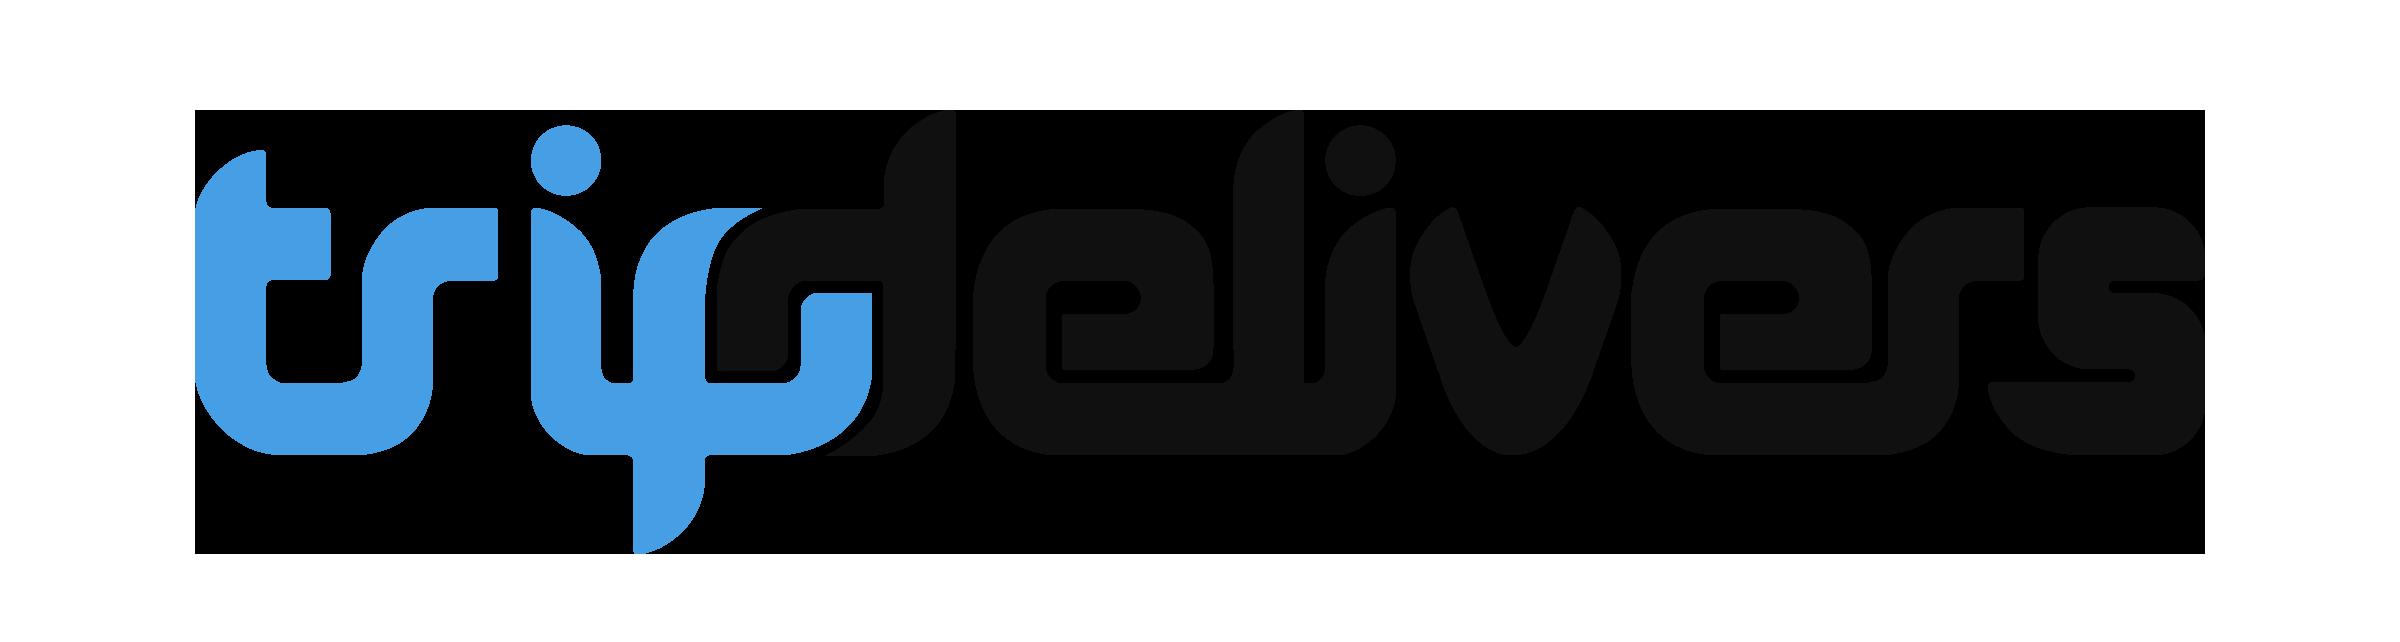 Tryp Technologies Inc Logo